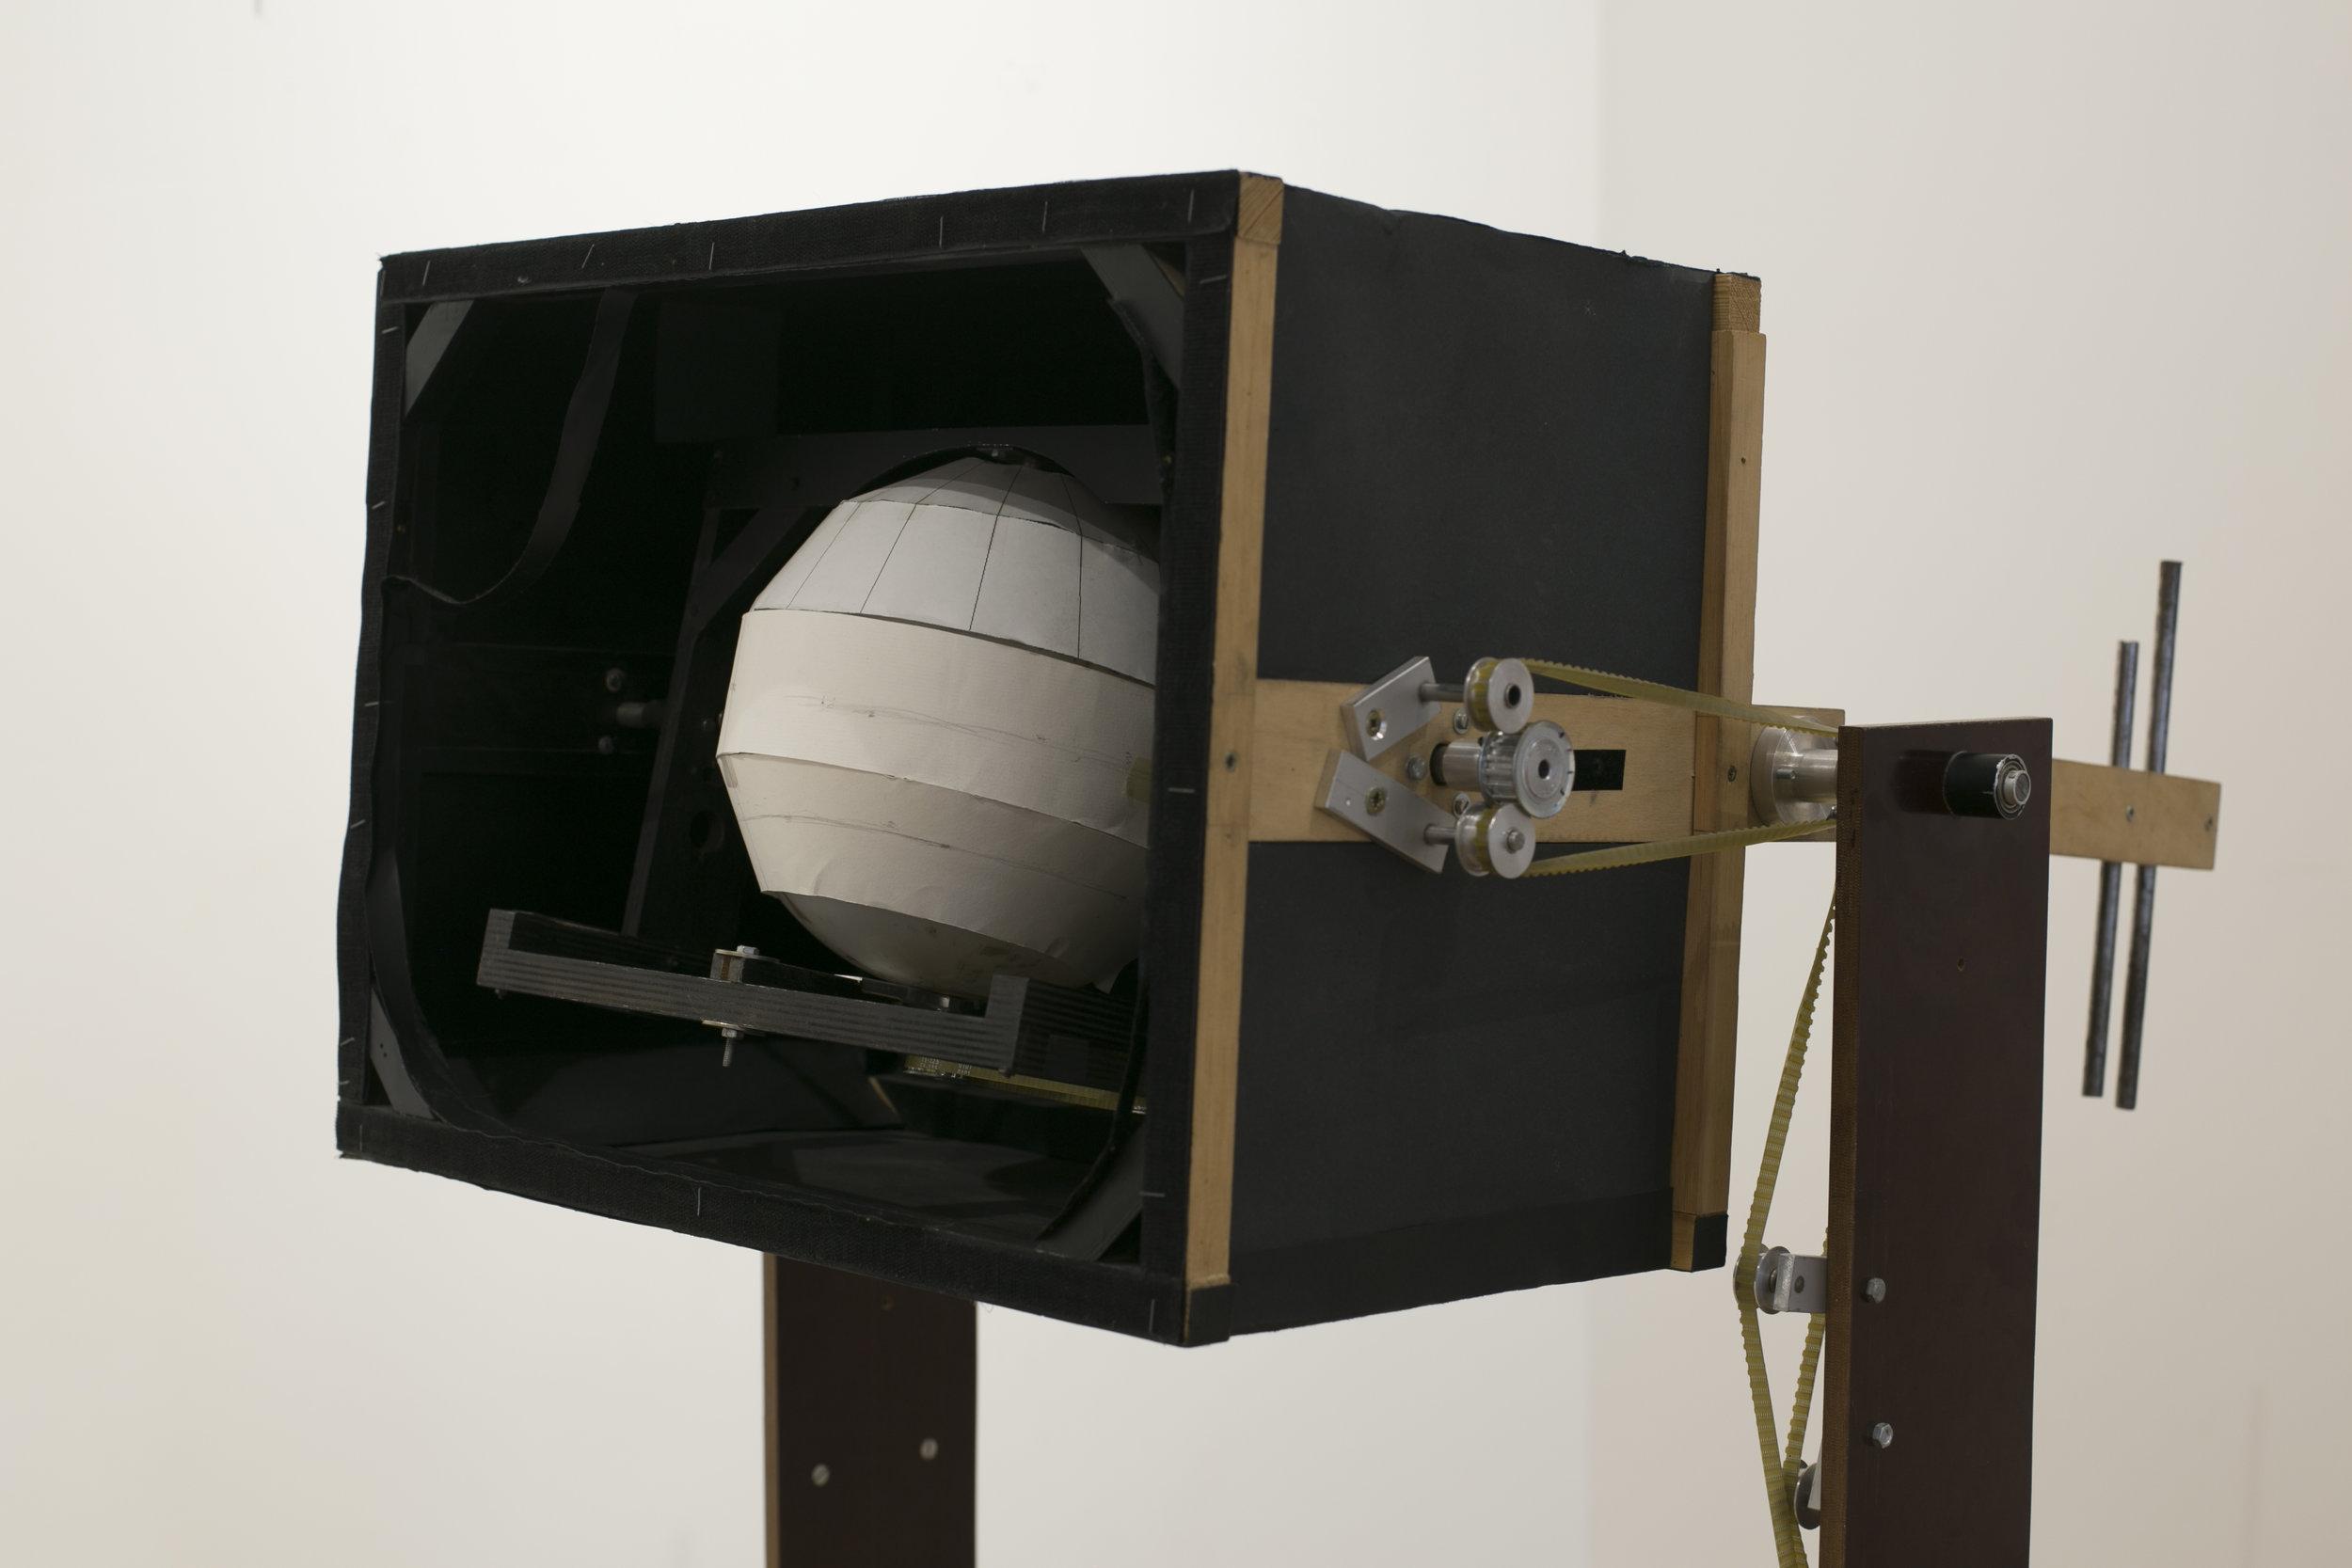 Narancs-tér kamera / Orange Space Camera, 2003